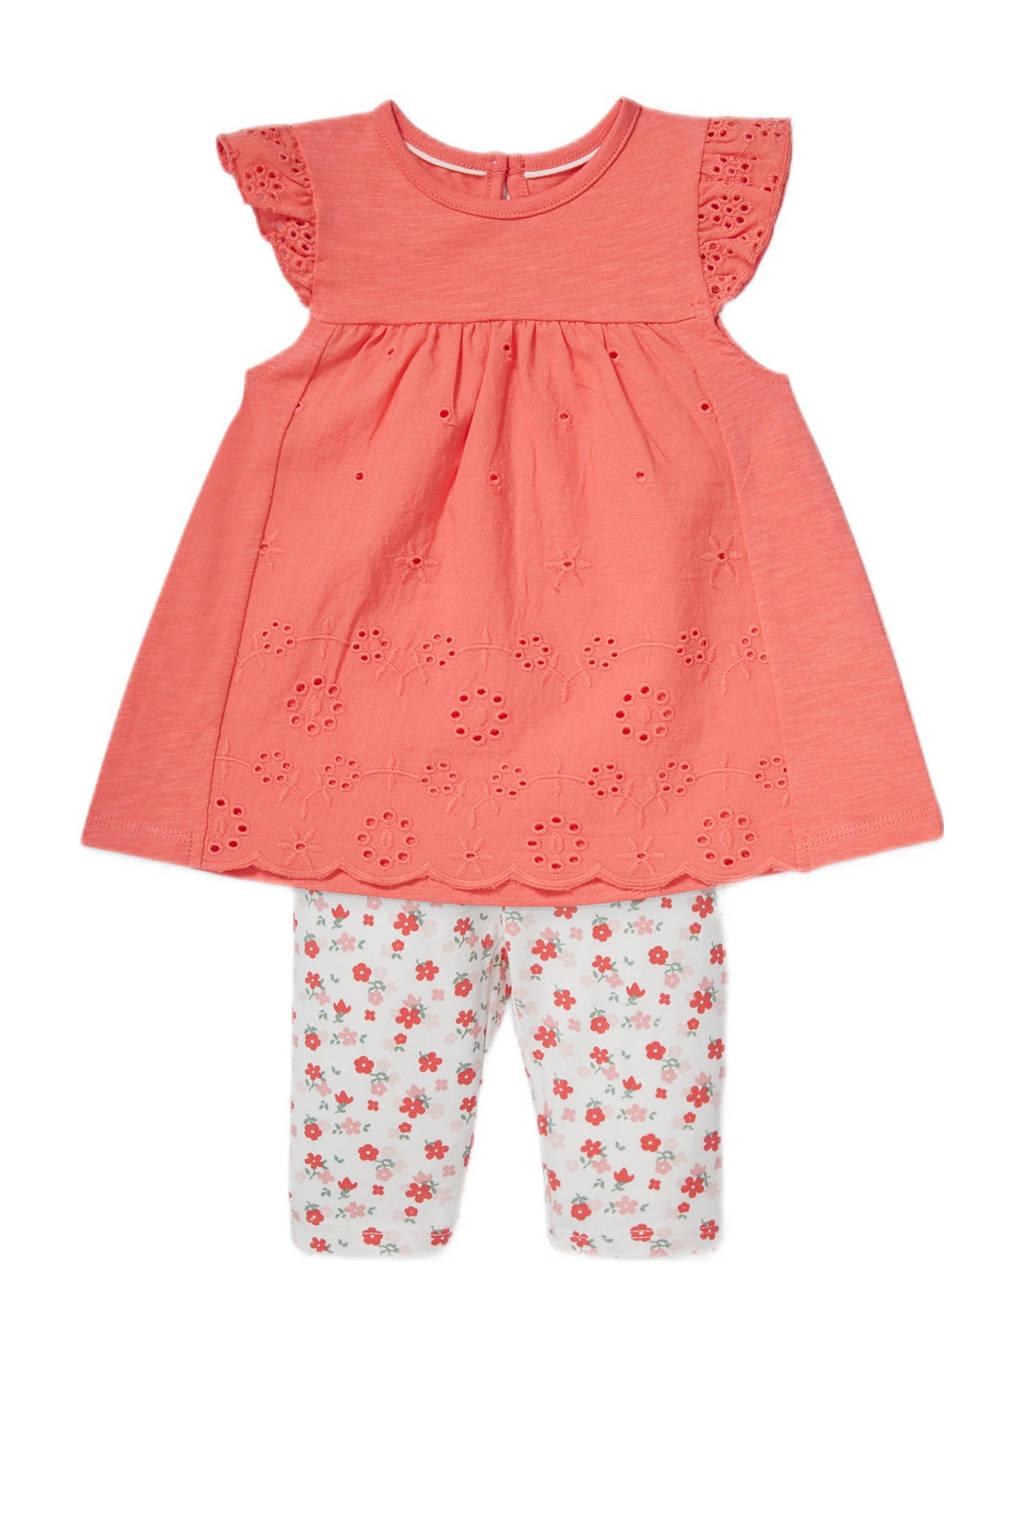 C&A Baby Club tuniek + legging, Koraalrood/wit